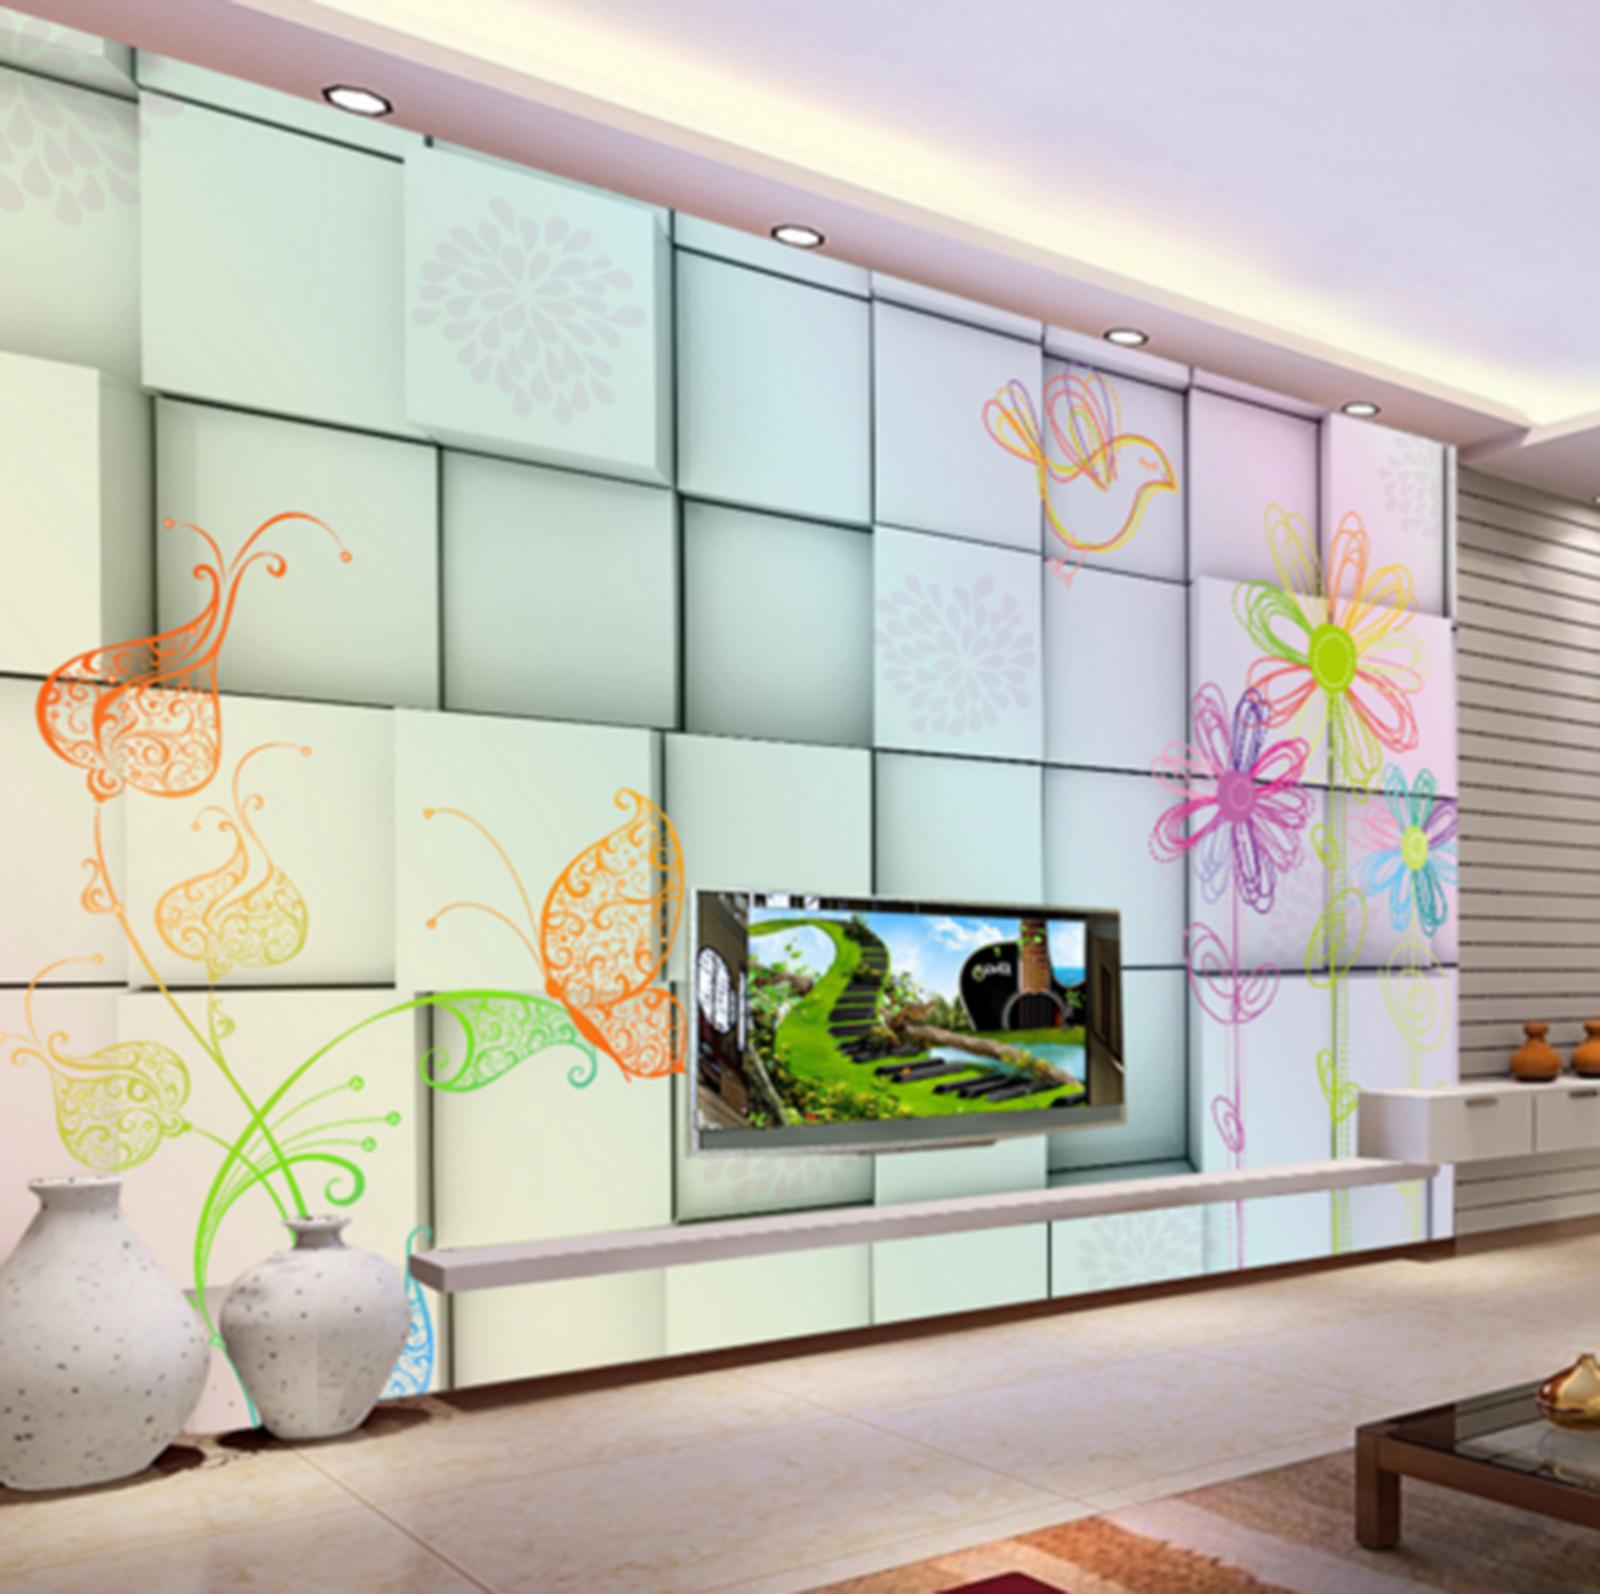 3D MulticoloROT 61 Wallpaper Murals Wall Print Wallpaper Mural AJ WALL UK Kyra